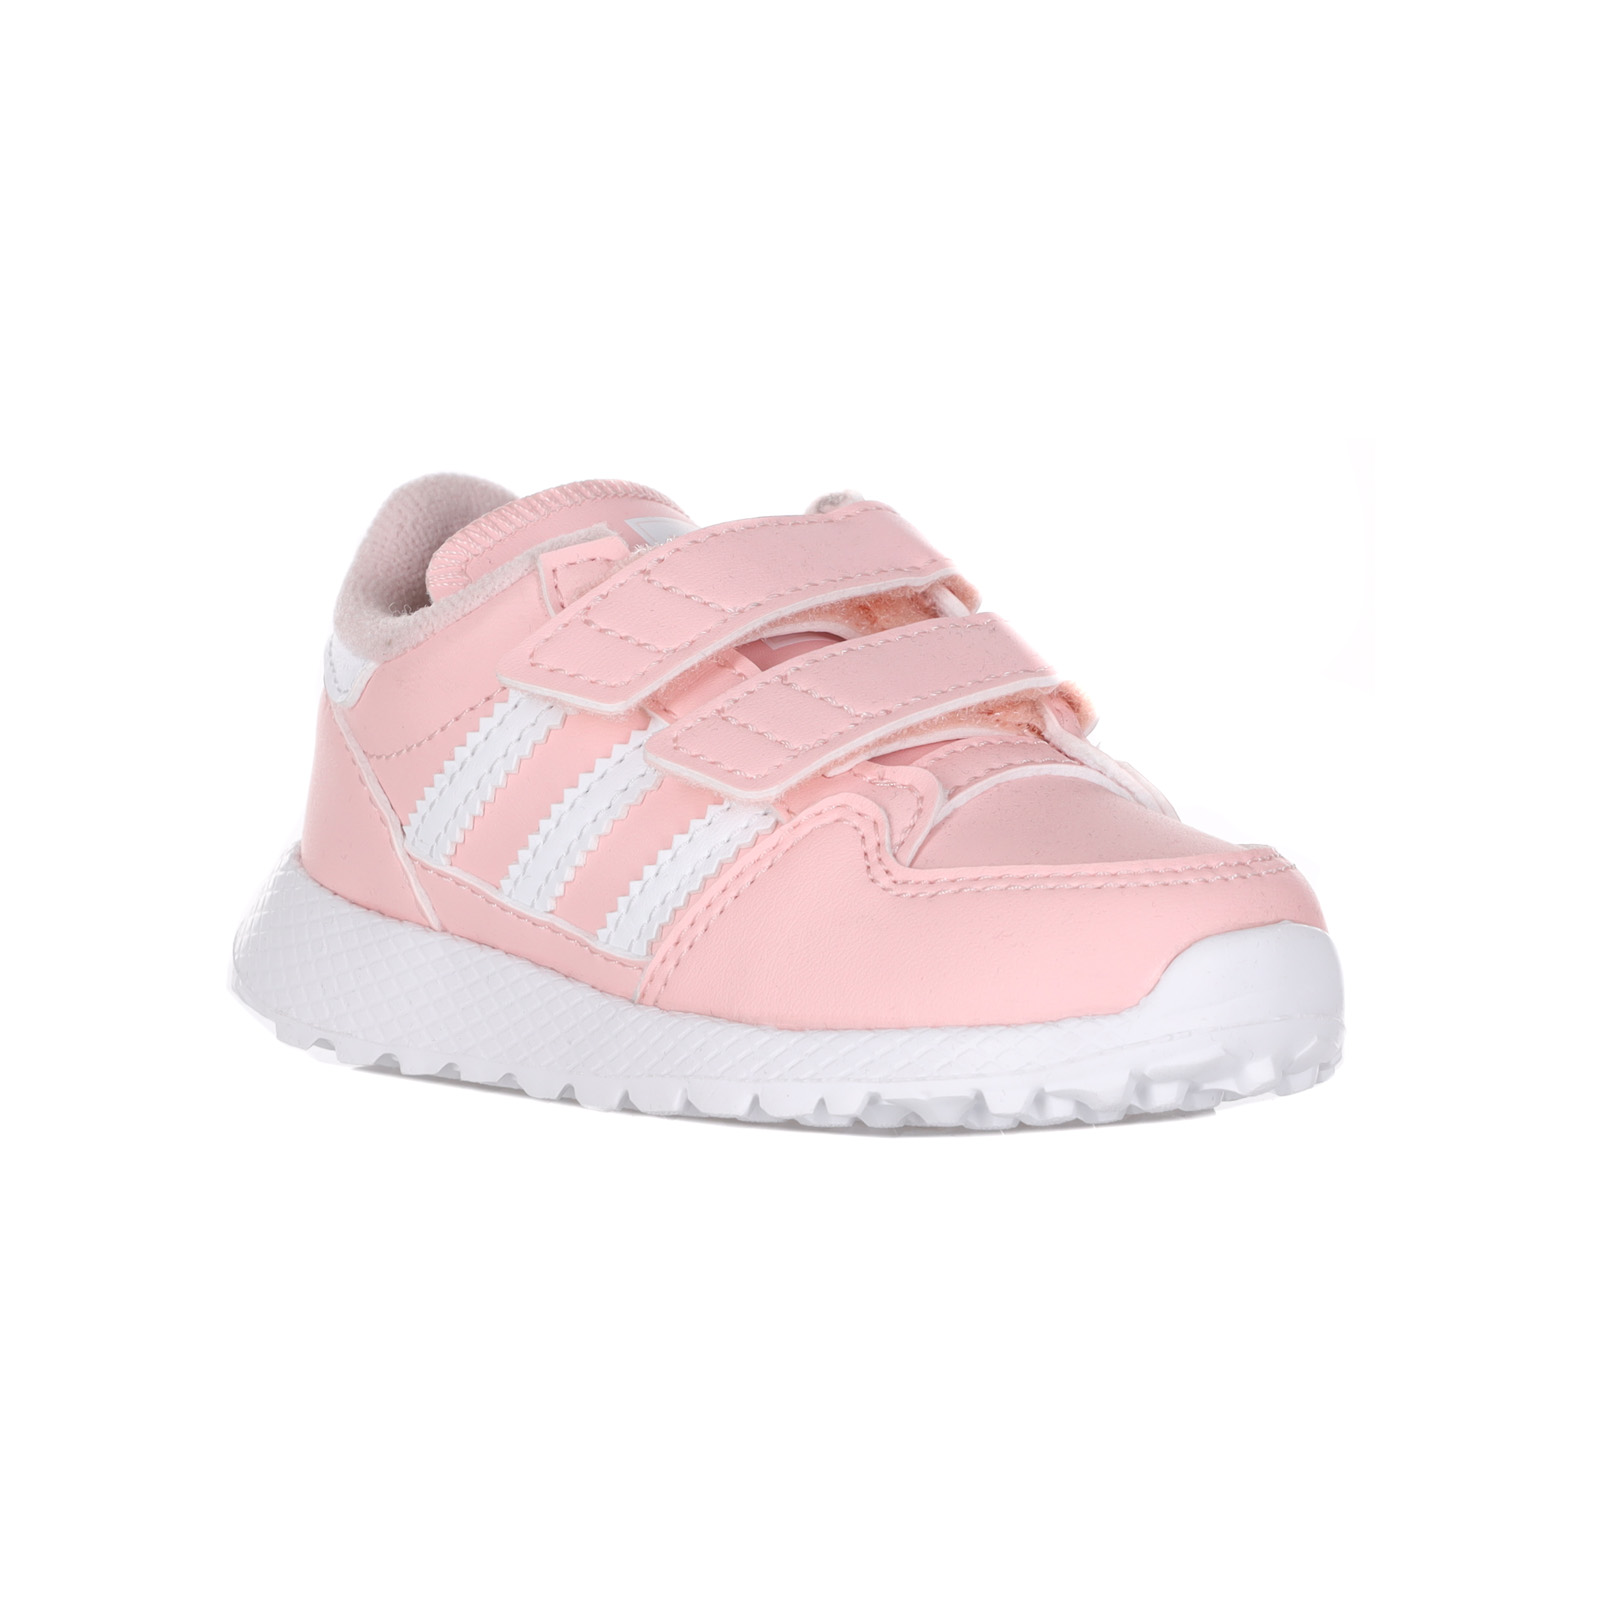 ADIDAS   Sneakers   EG8965ICEPNK/FTWWHT